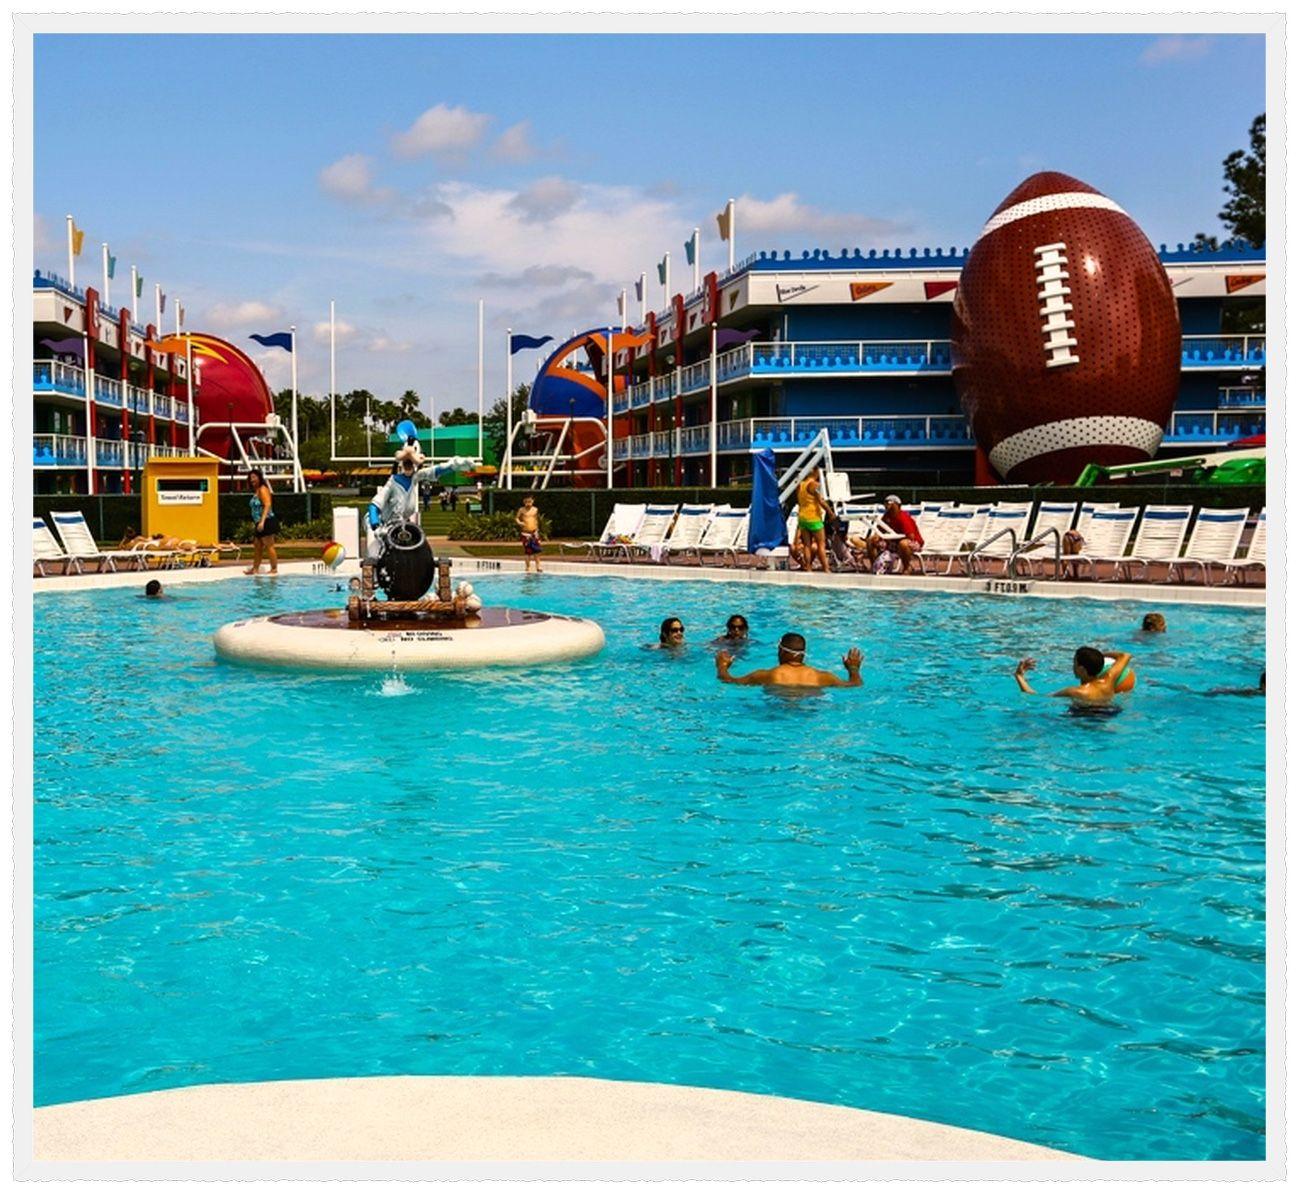 Orlando, Florida Disney's AllStar Sports Resort is a